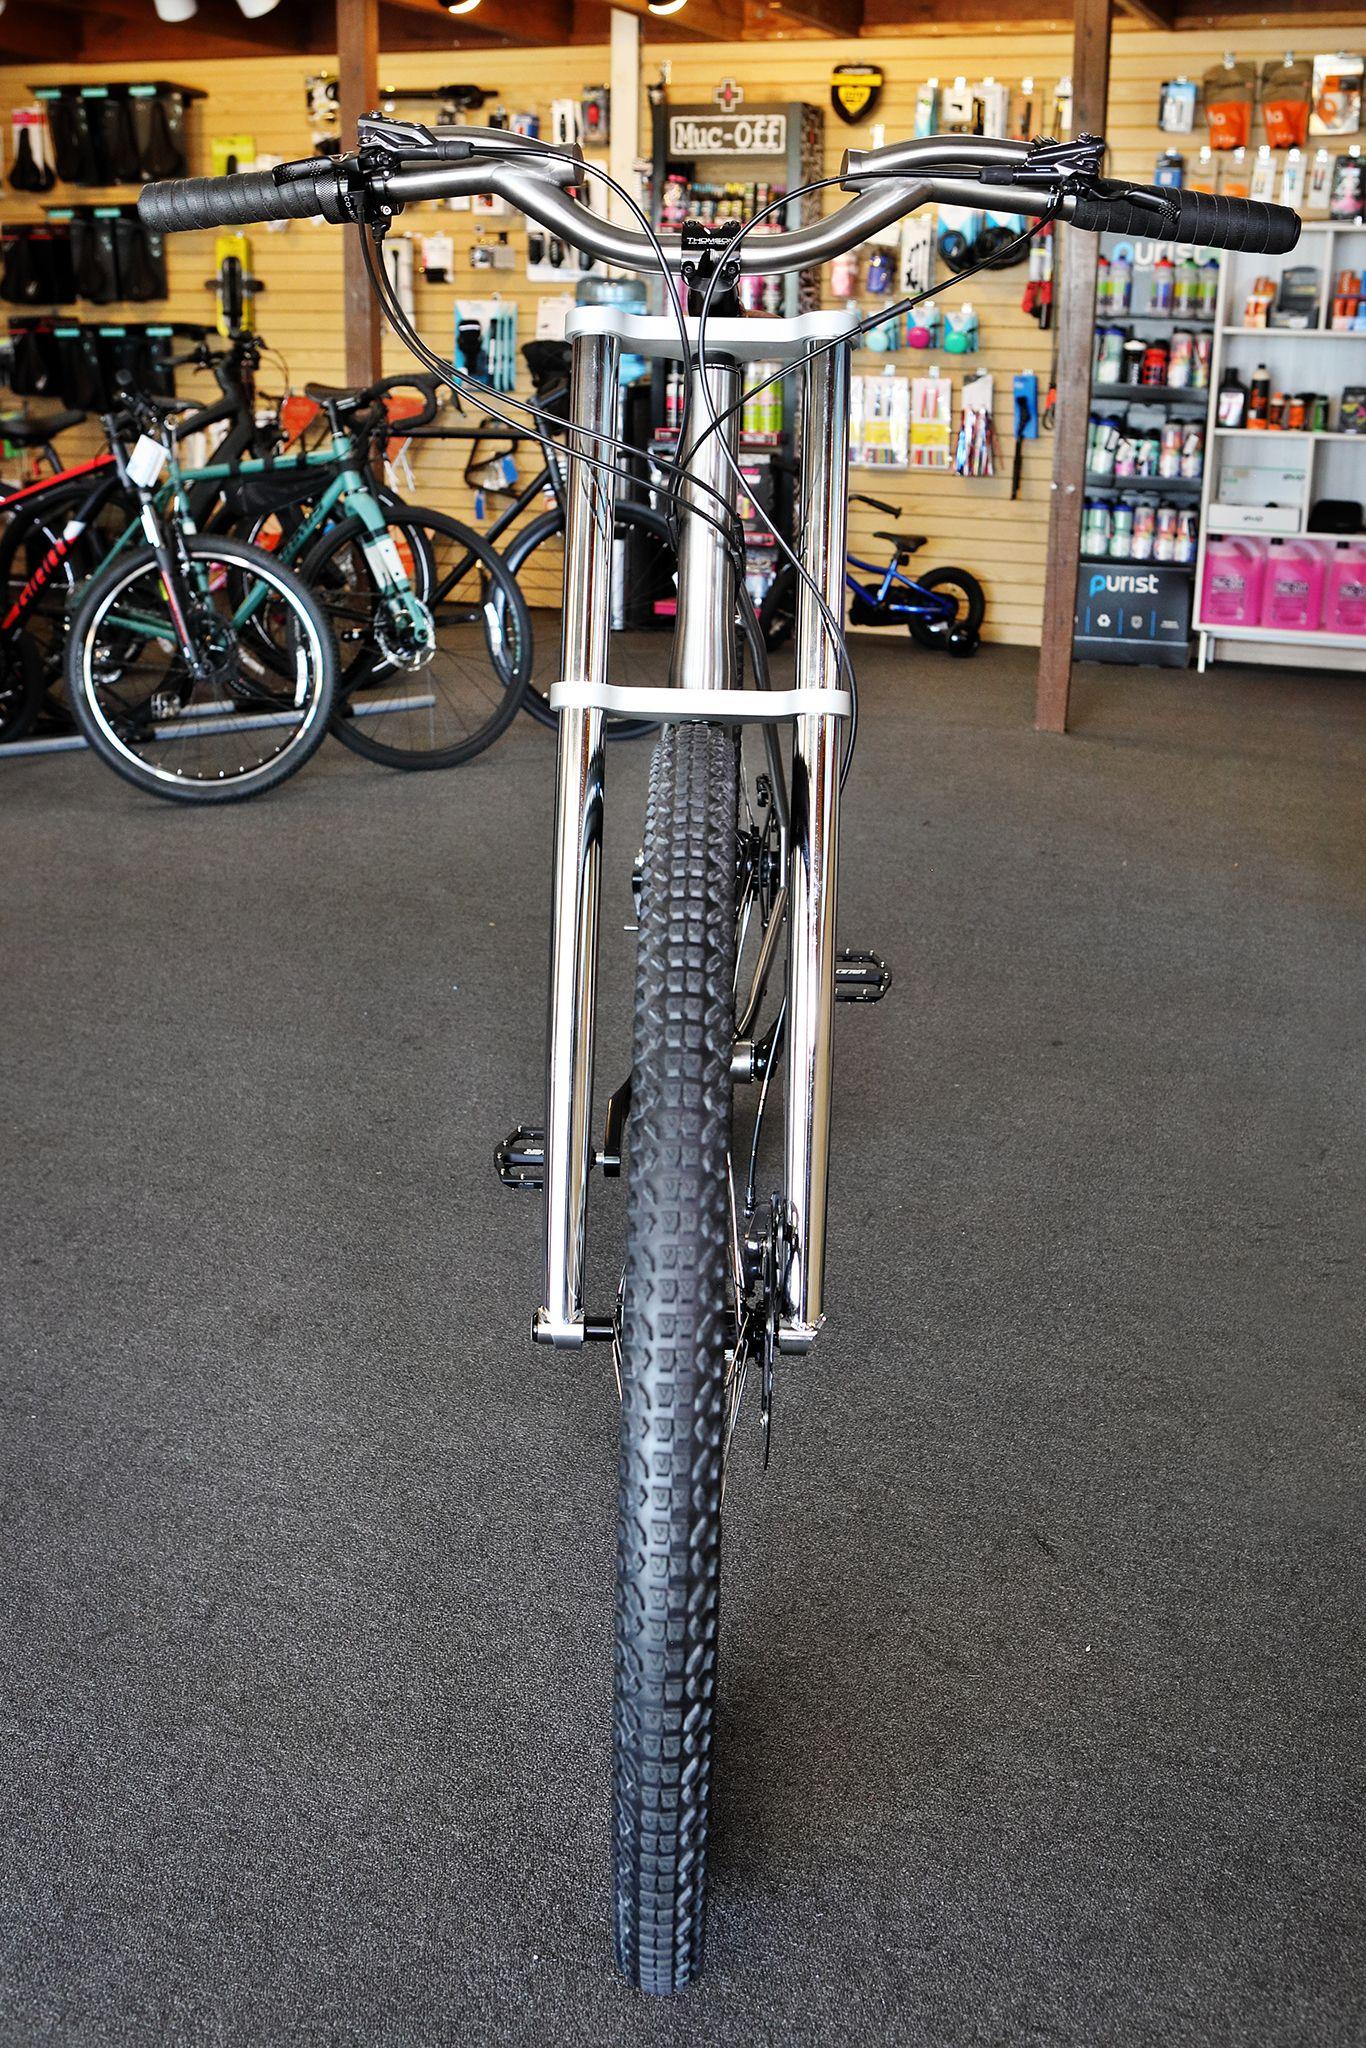 shaq bike